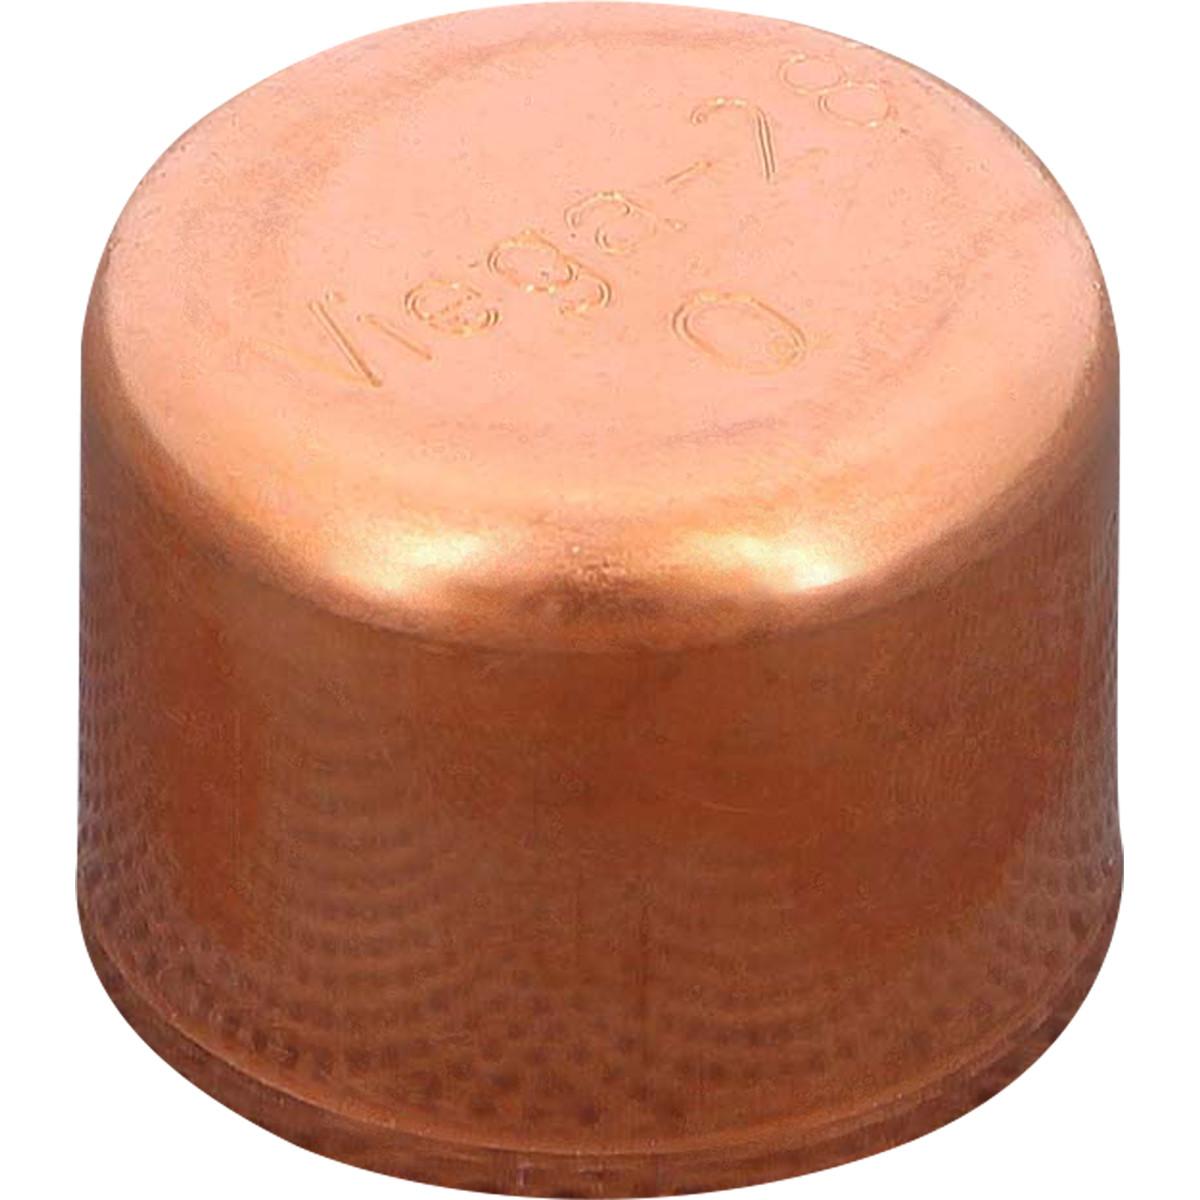 Заглушка пайка Viega 28 мм медь